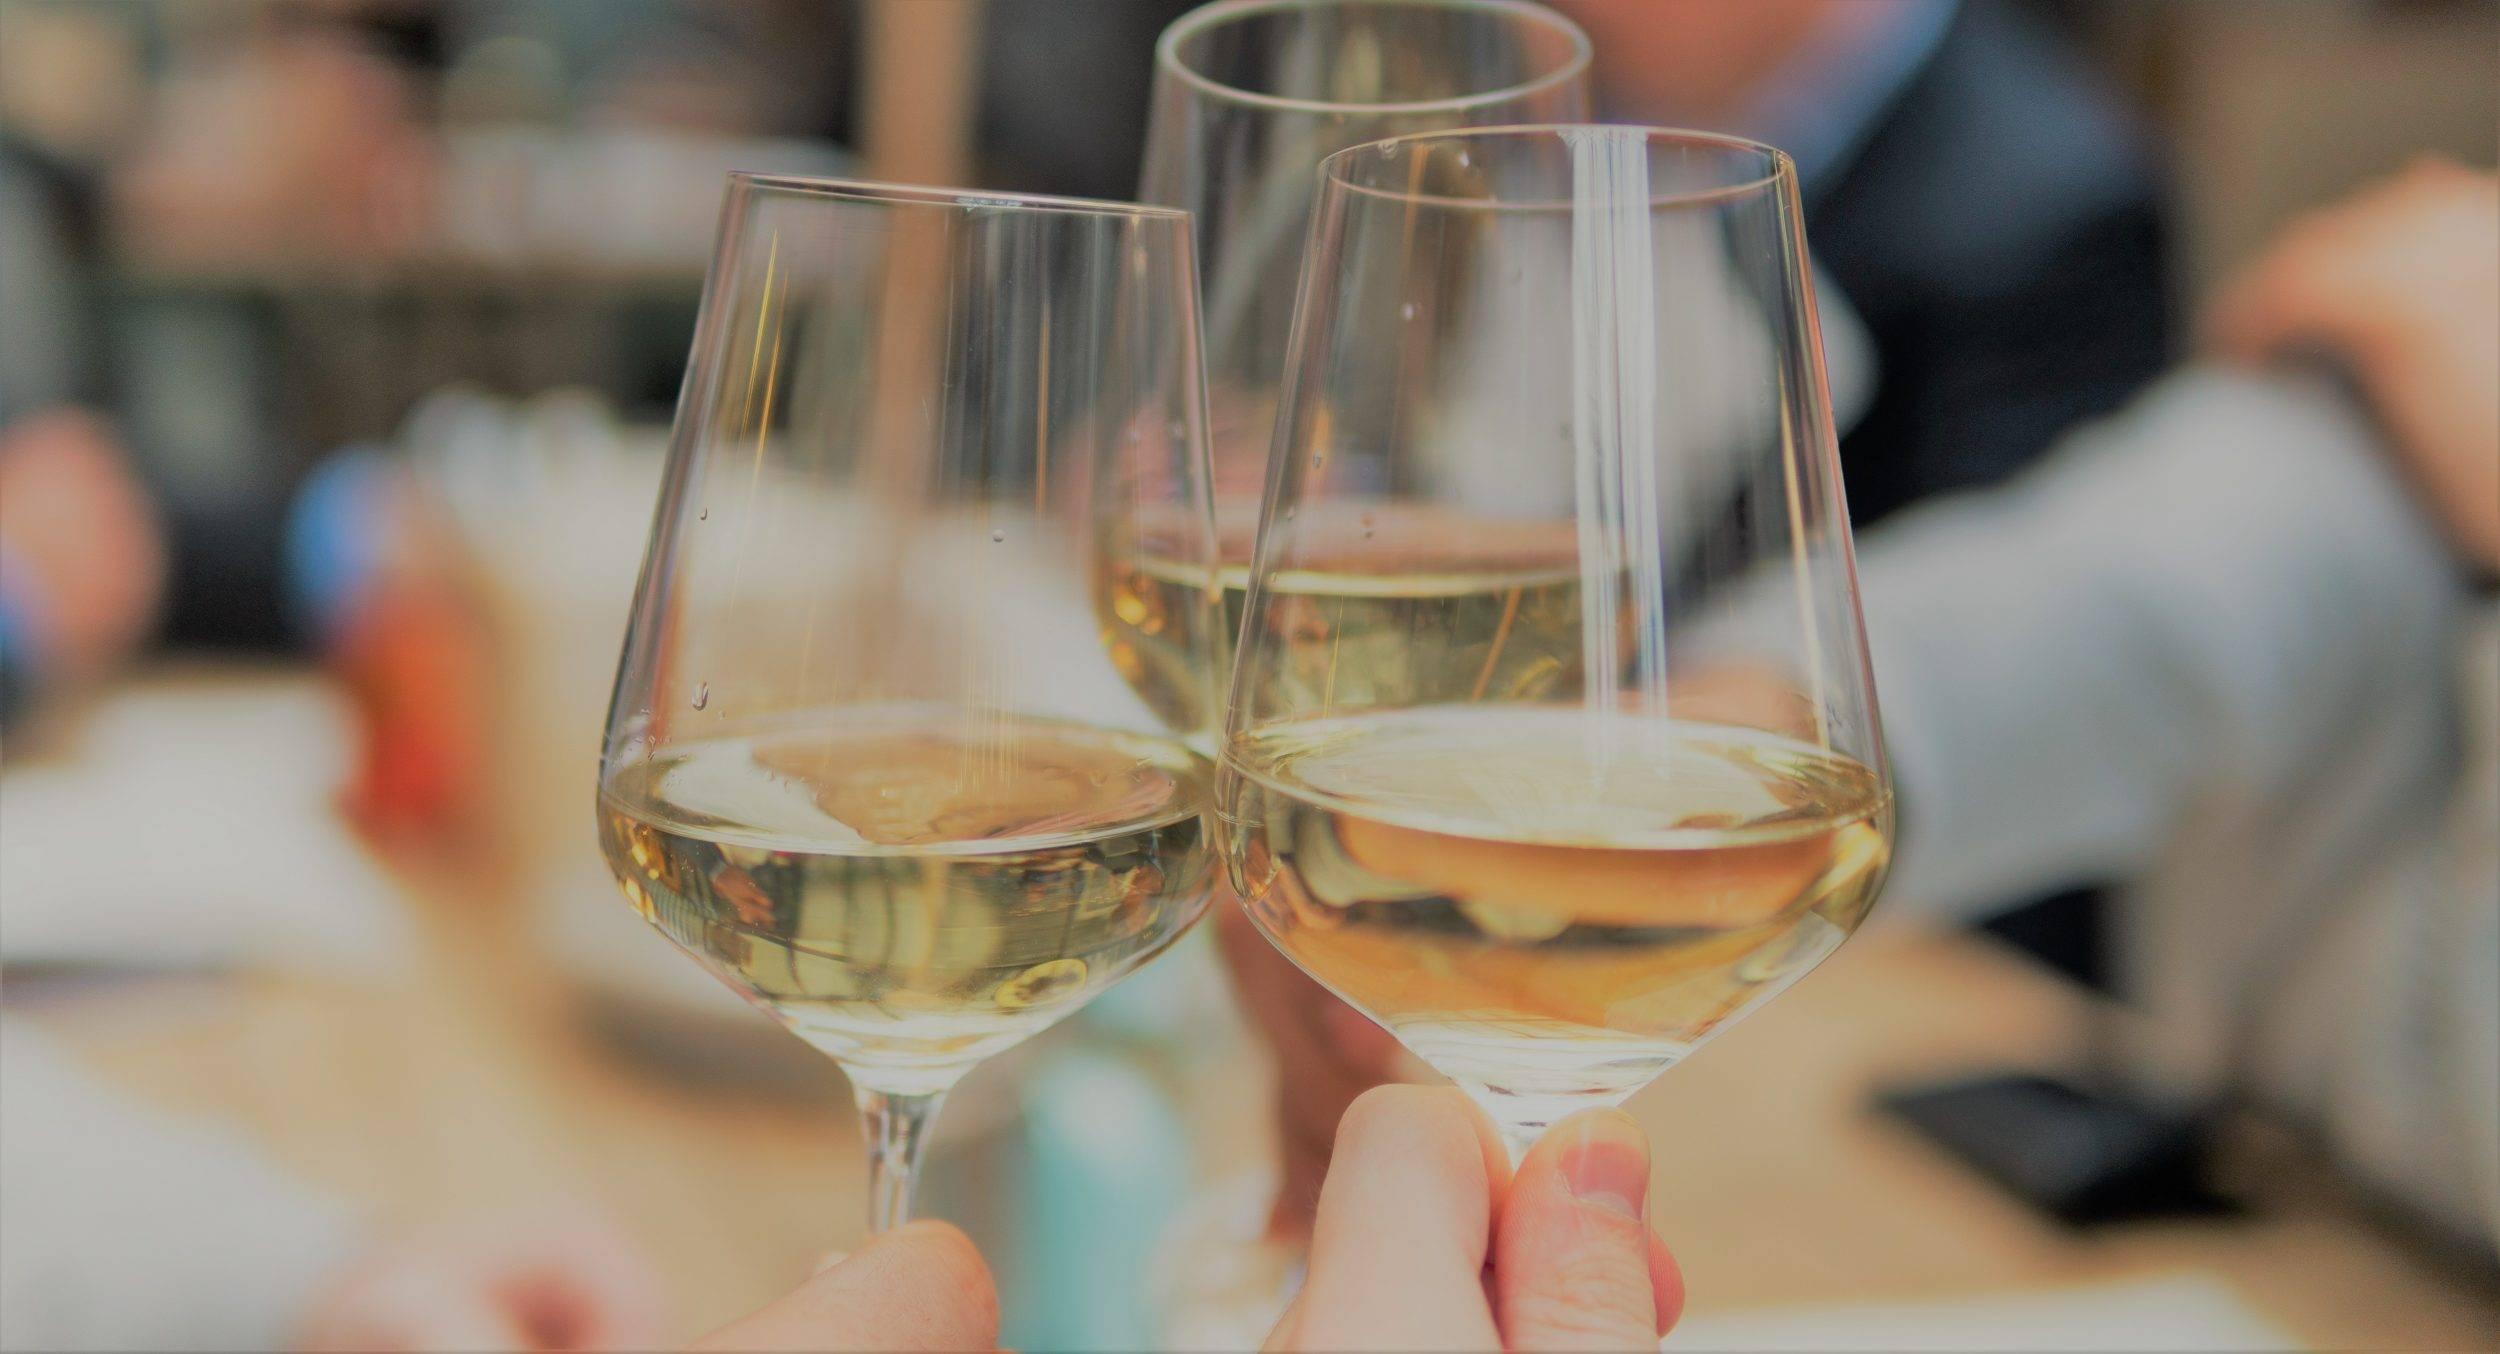 www.juicysantos.com.br - acausa wine em santos sp